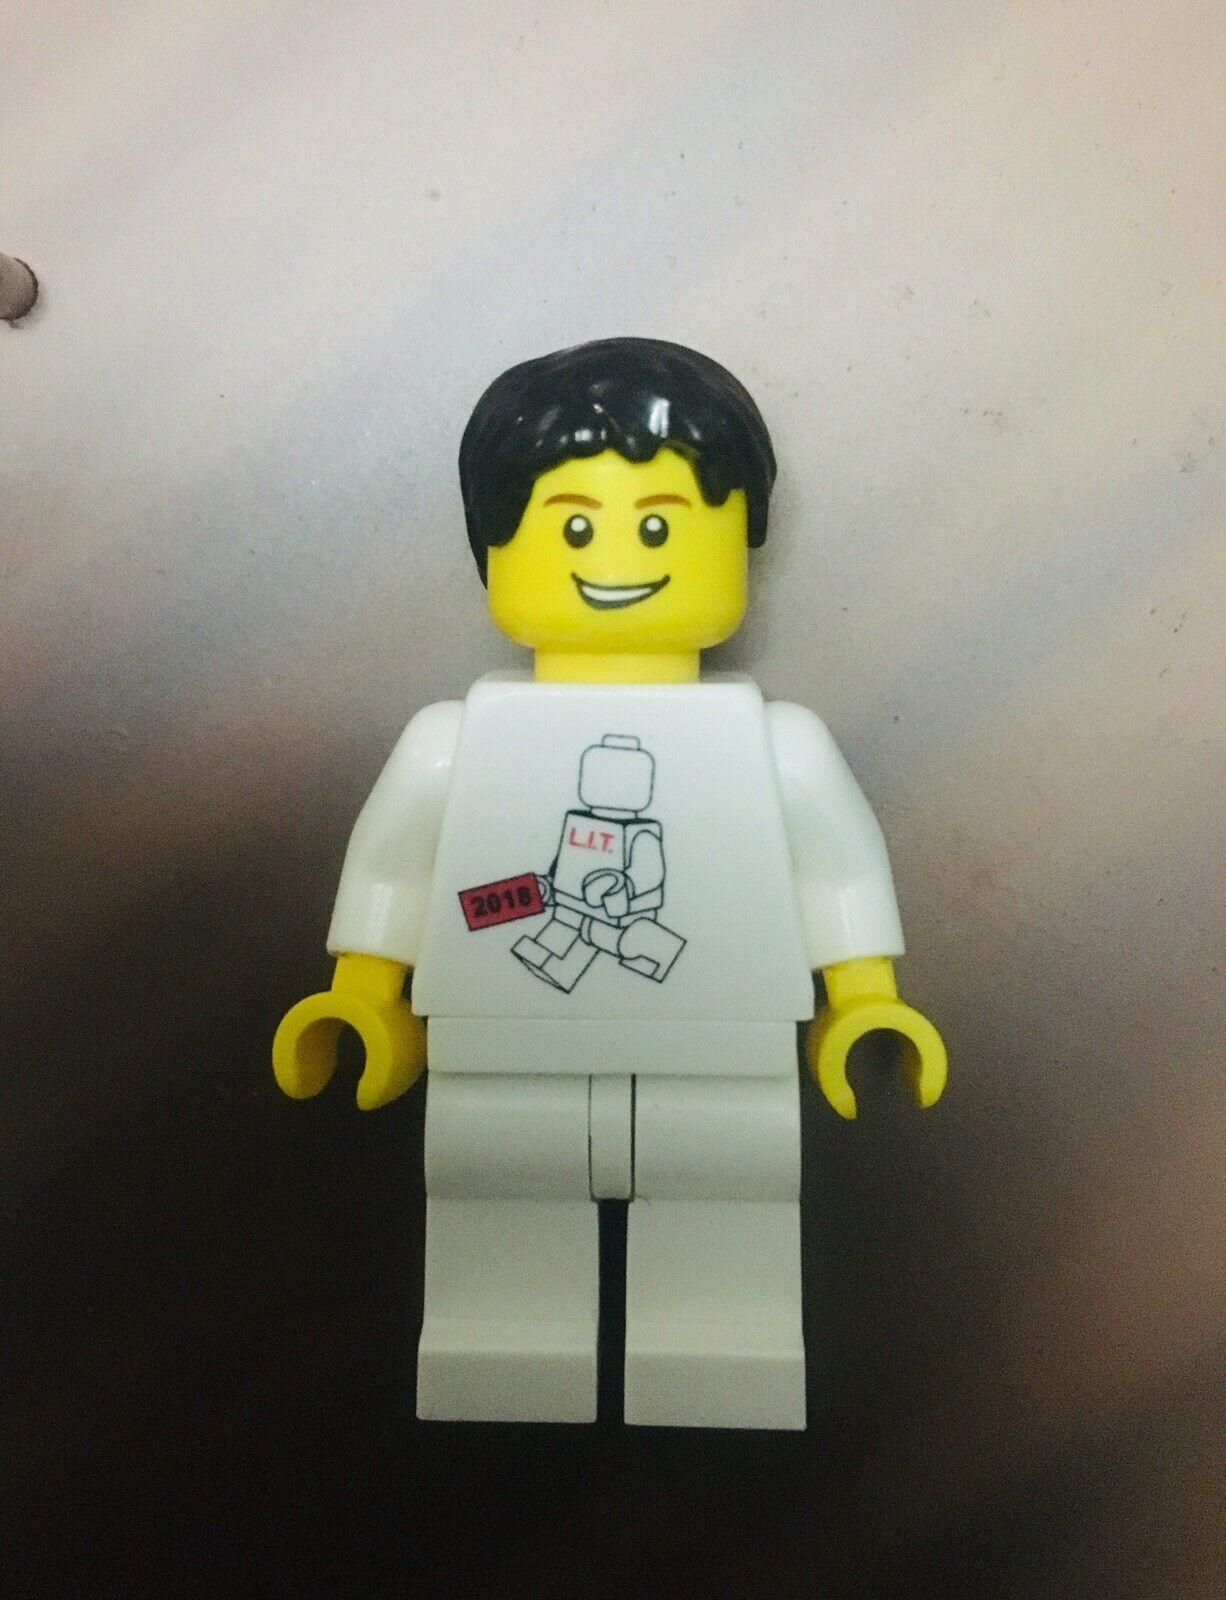 Lego inside tour 2018 minicifras  extremely rare lit ltd authentic SDCC NYCC  prima i clienti